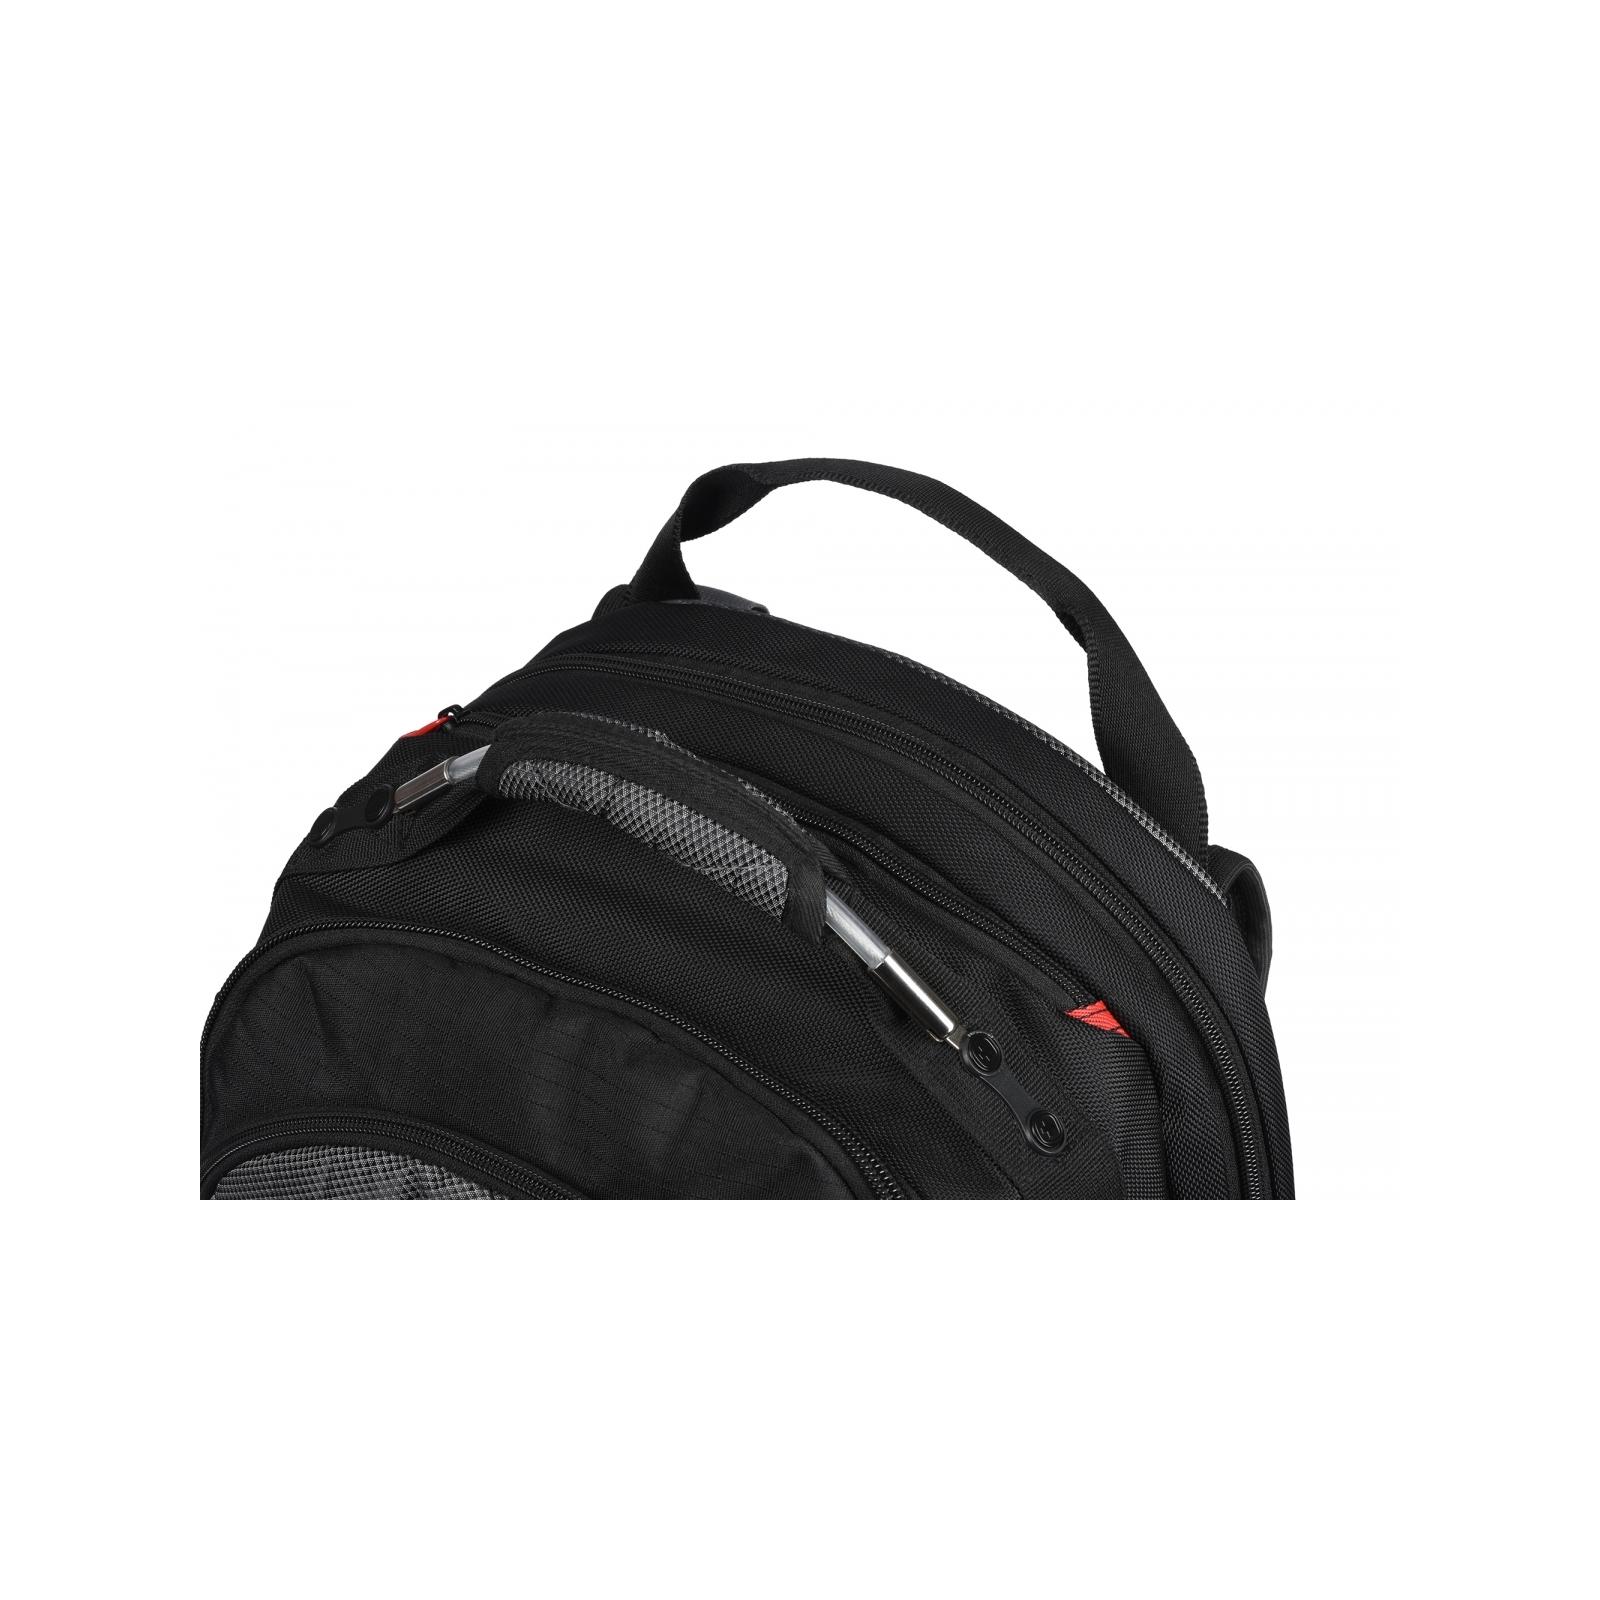 "Рюкзак для ноутбука Wenger 16"" Synergy Black/Gray (600635) изображение 12"